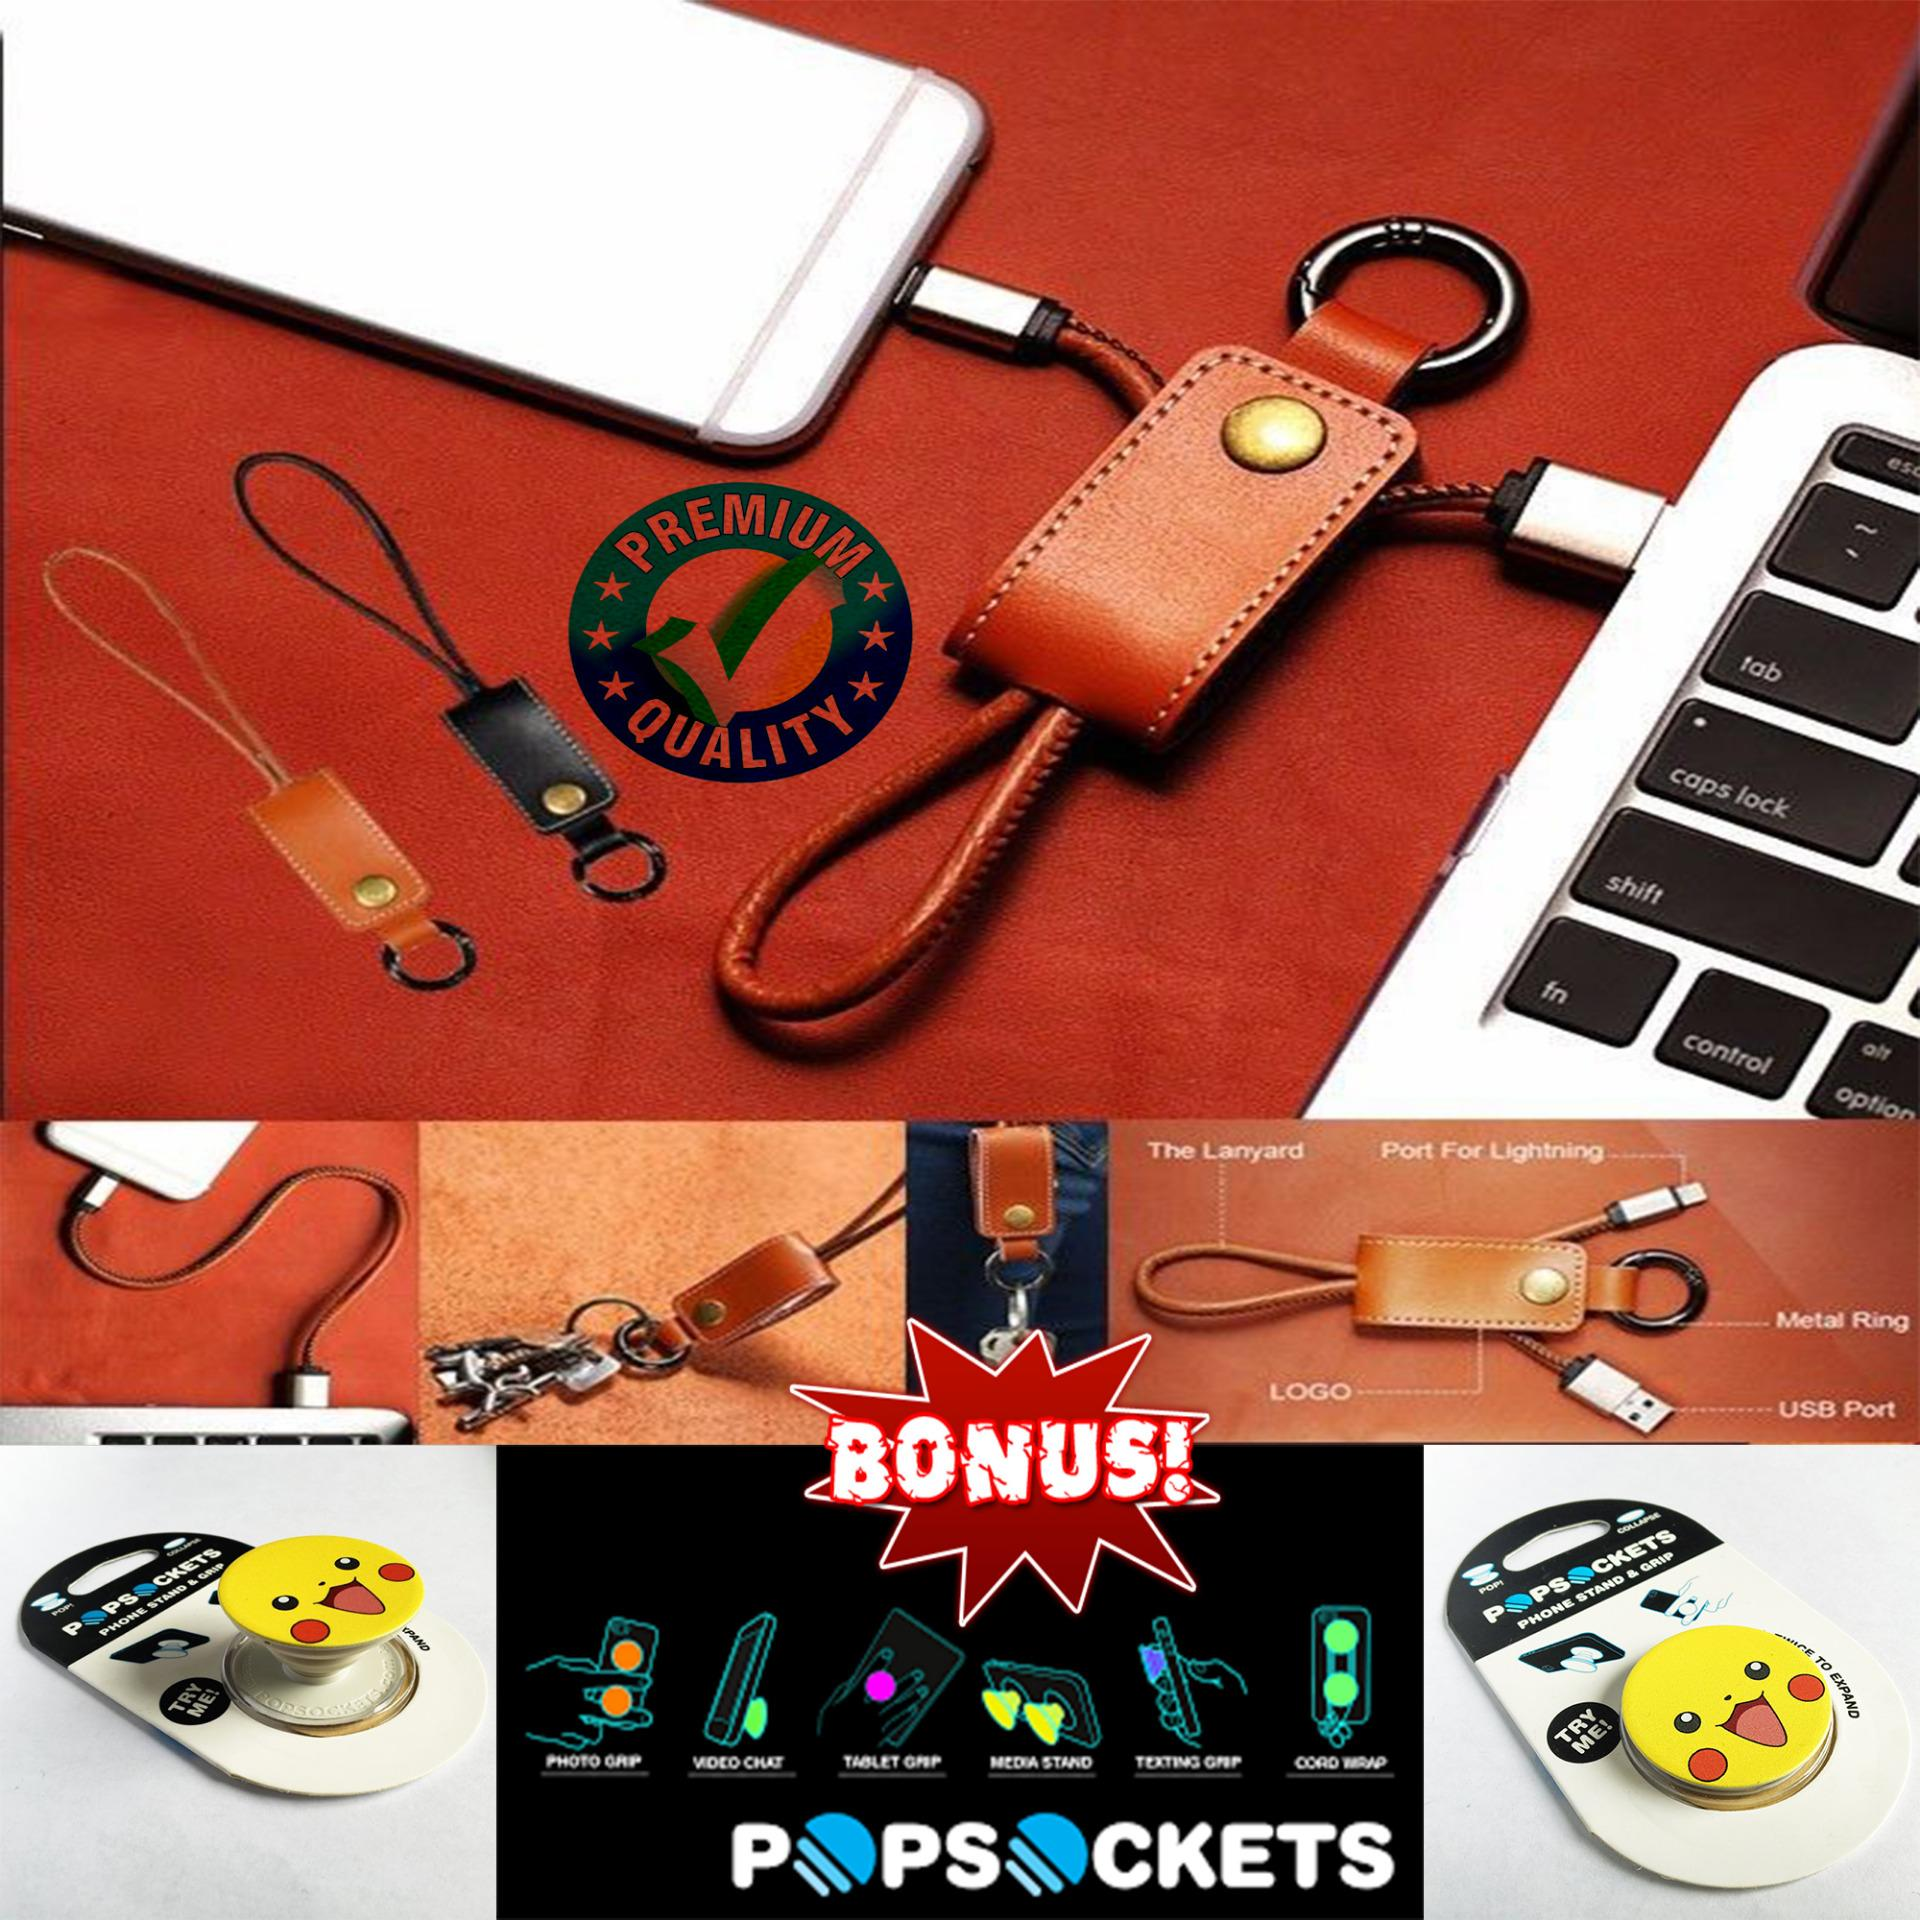 Trend's Kabel Data Micro Usb / Kabel Charger / Gantungan Kunci / Key Chain Leather Usb Data Charger Cable - Hitam + Gratis Pop Socket / Stand Grip Smartphone